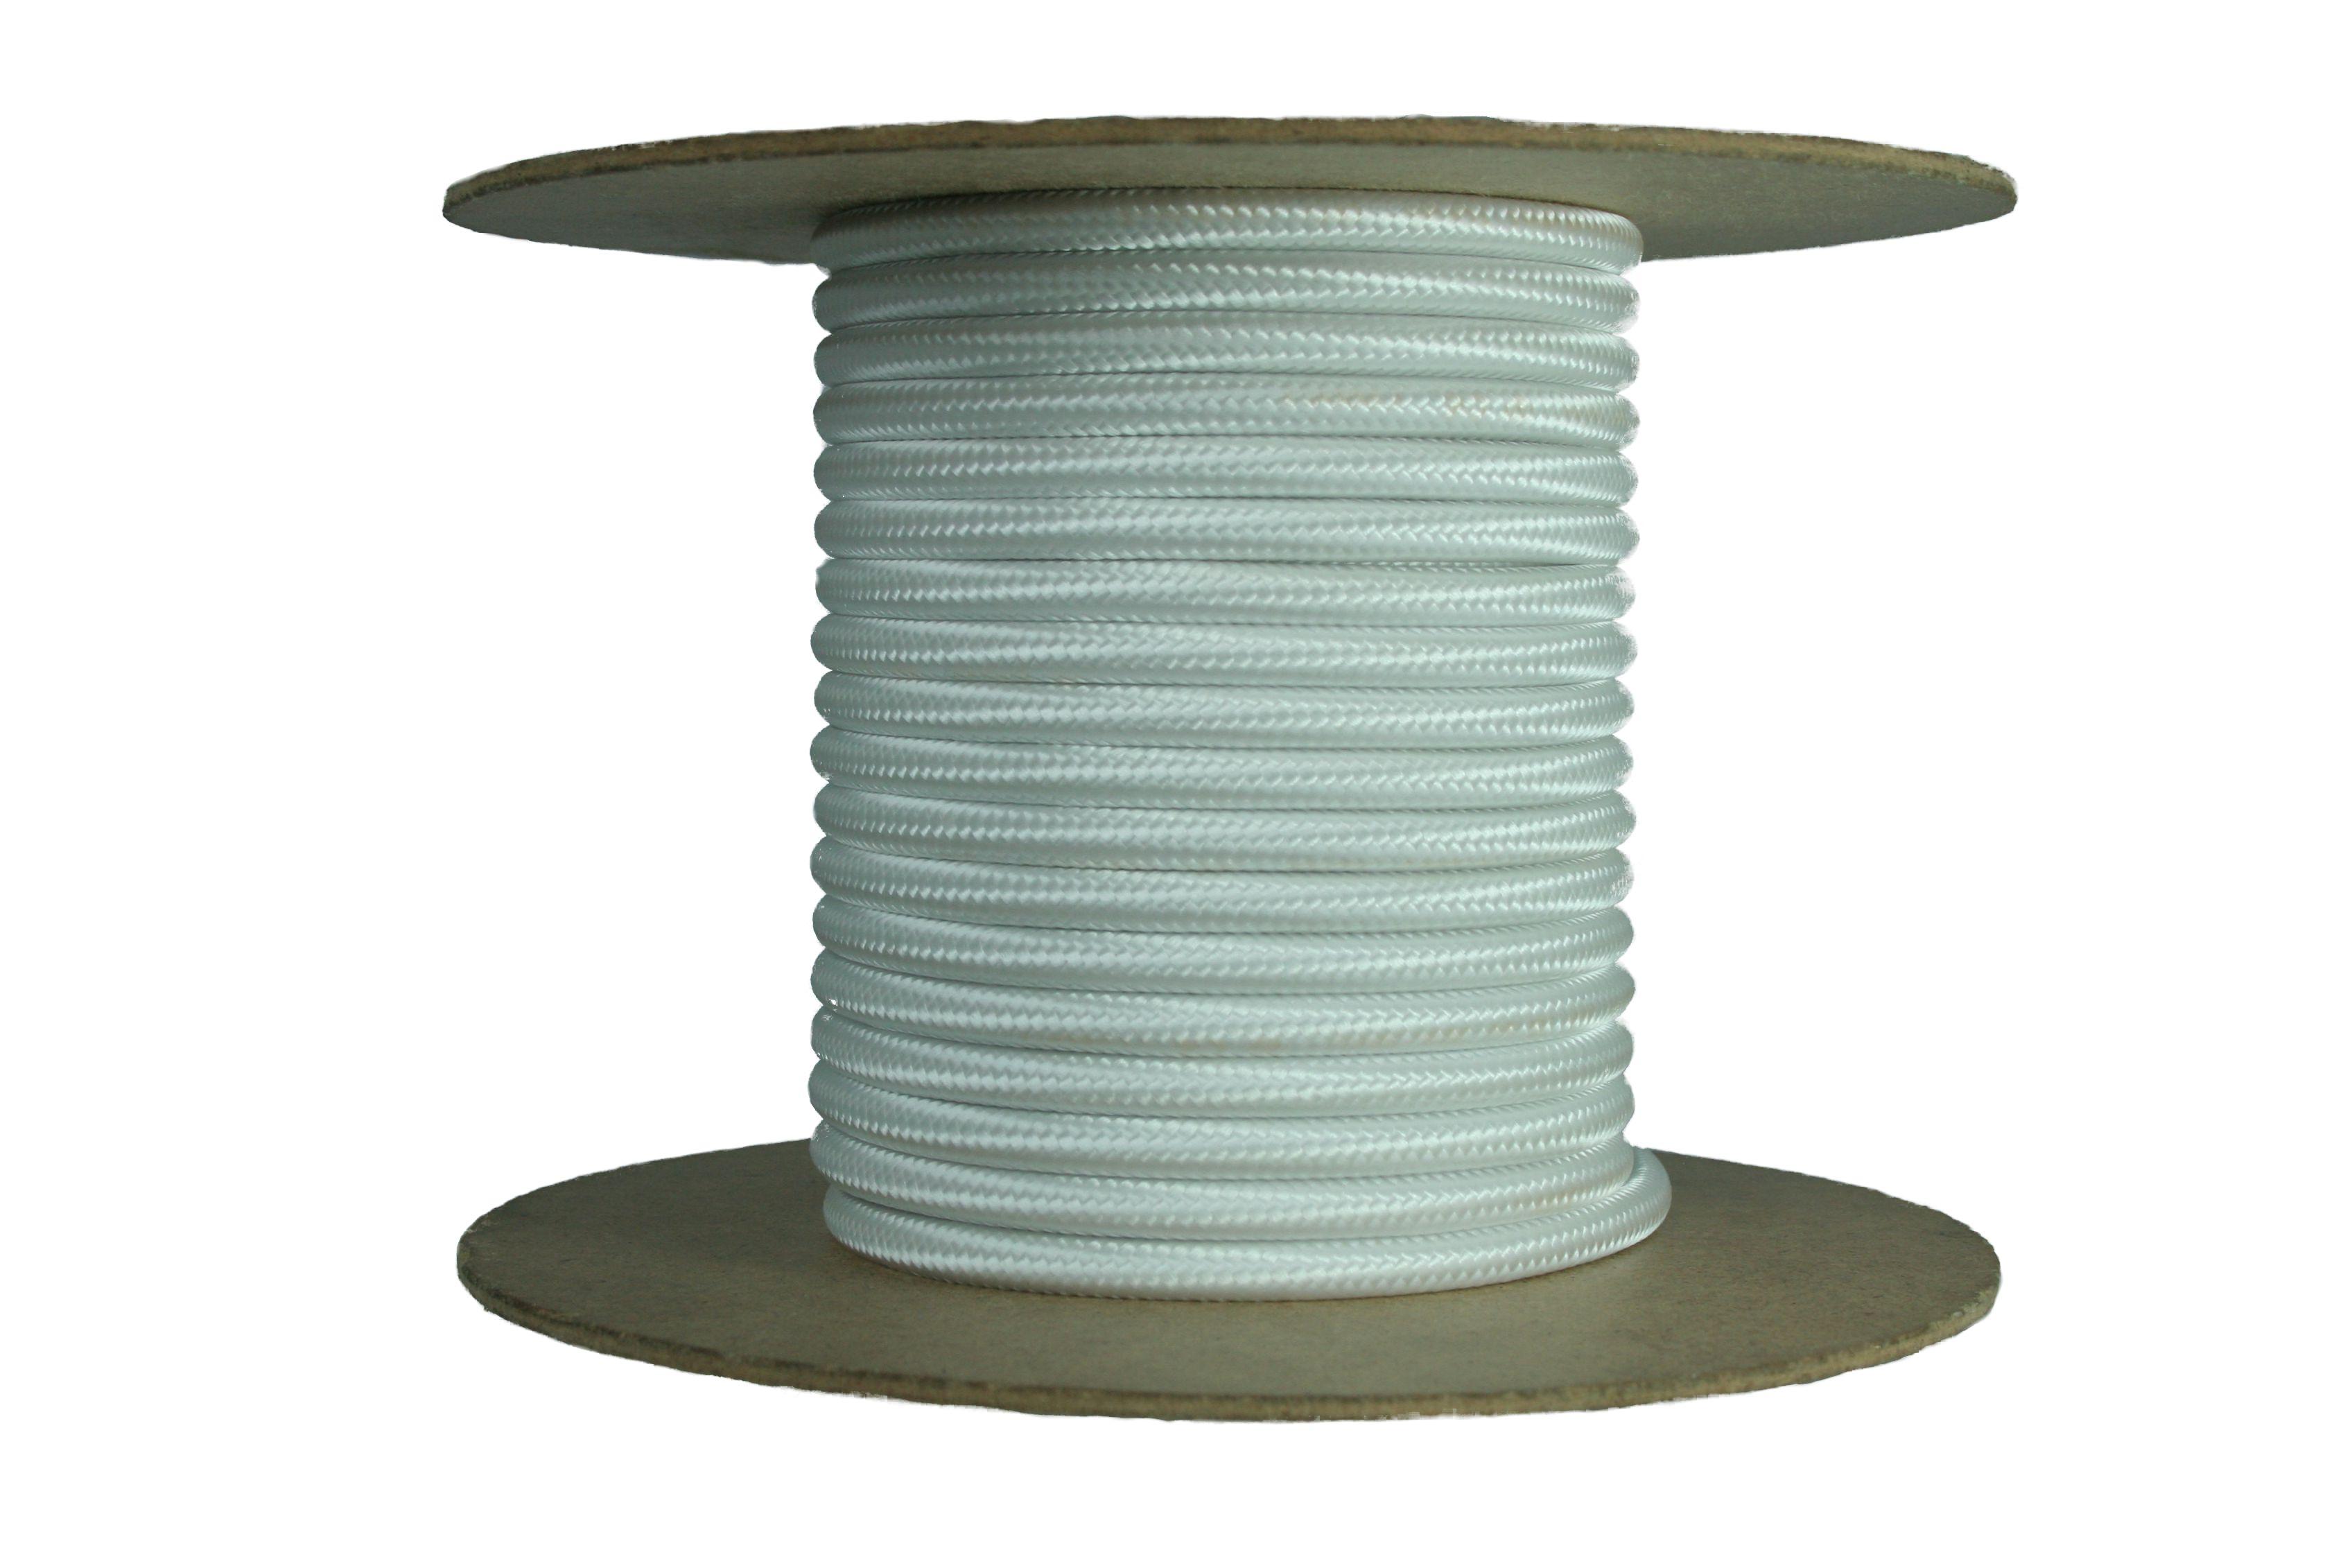 Oplot na kablach GL01